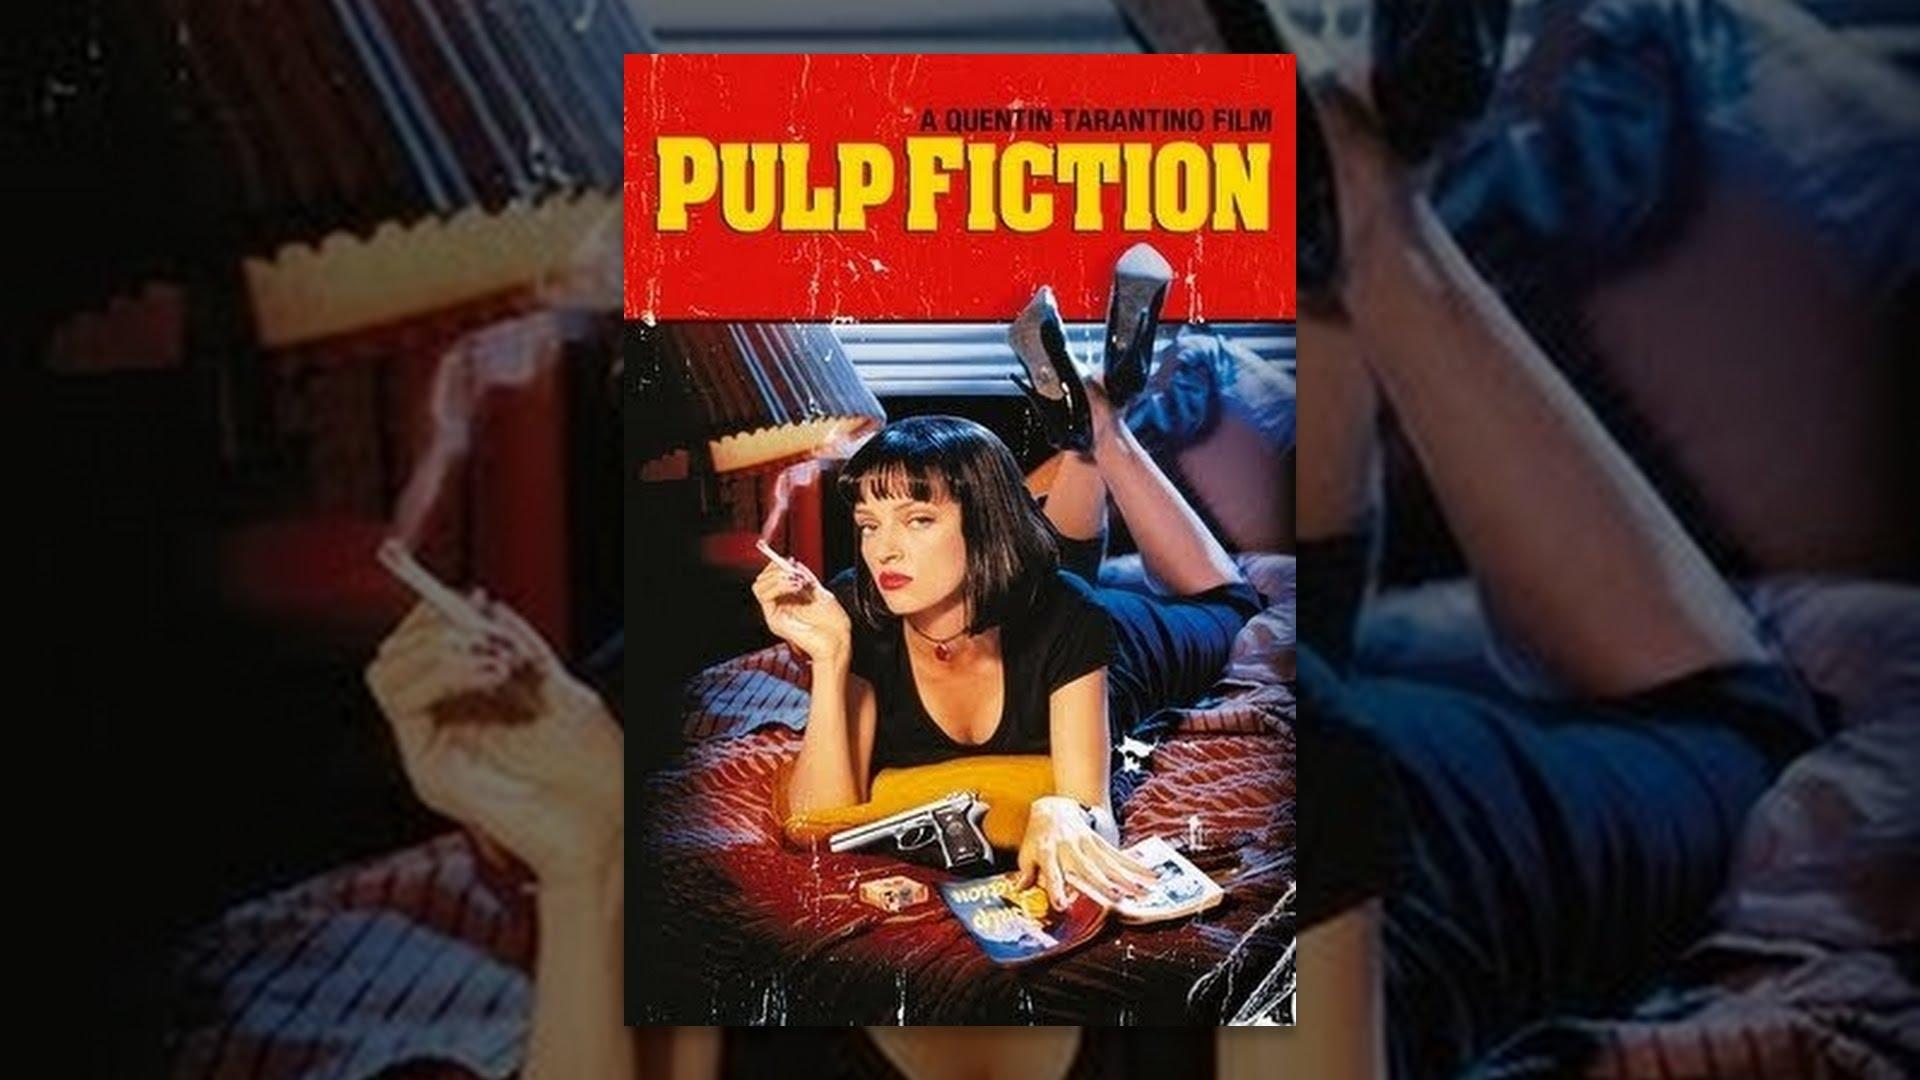 Pulp fiction release date in Brisbane